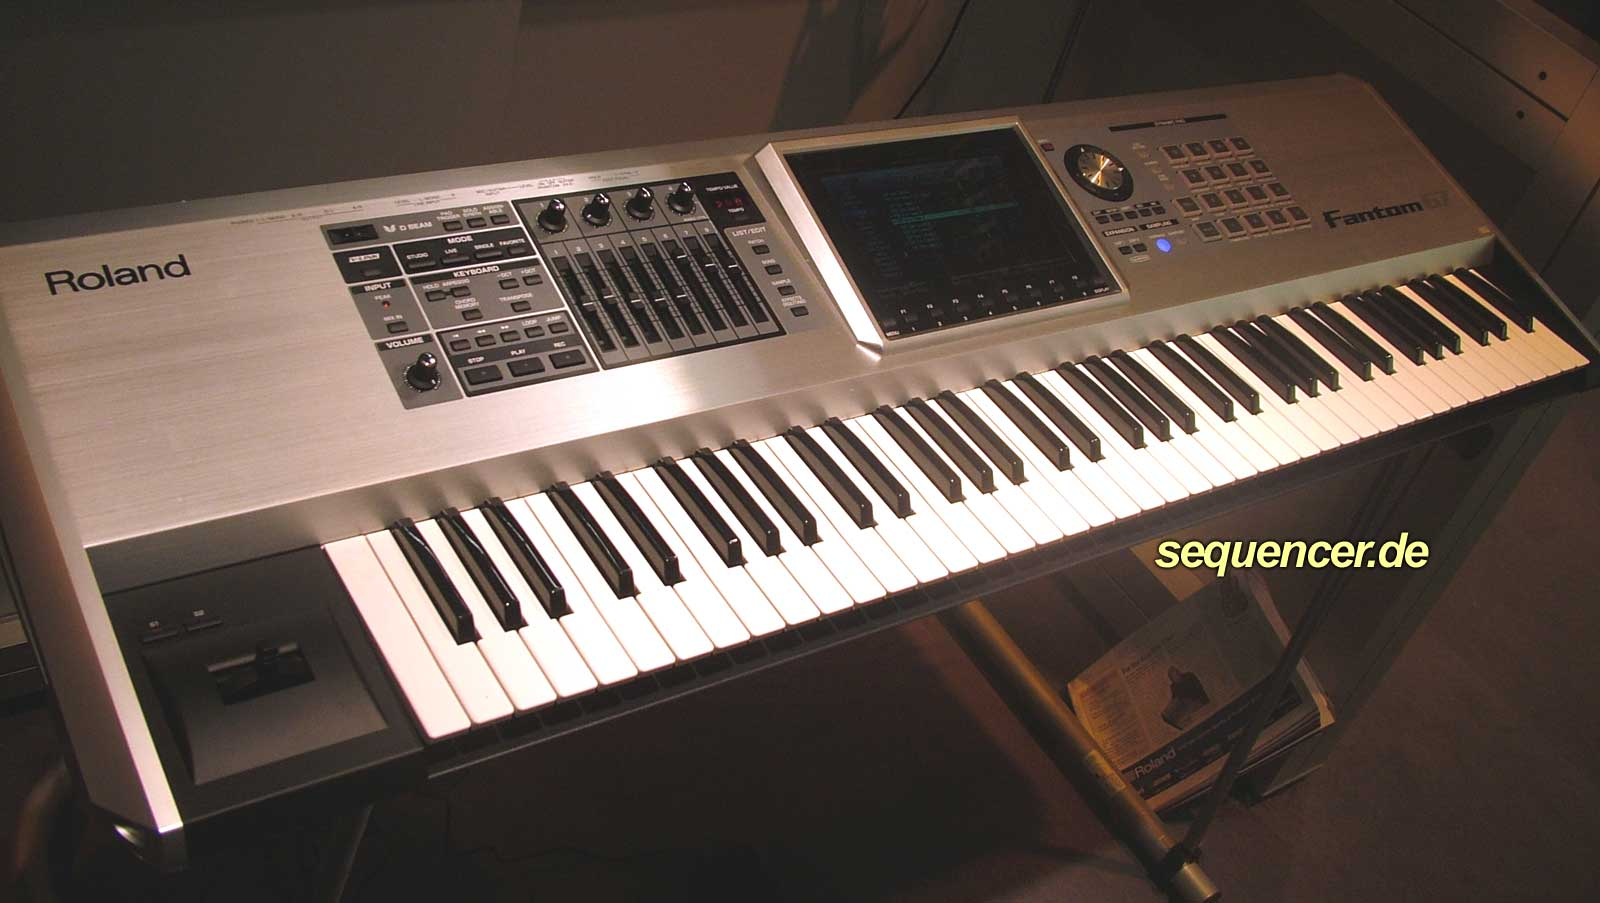 Roland FantomG6 FantomG7 FantomG8 synthesizer